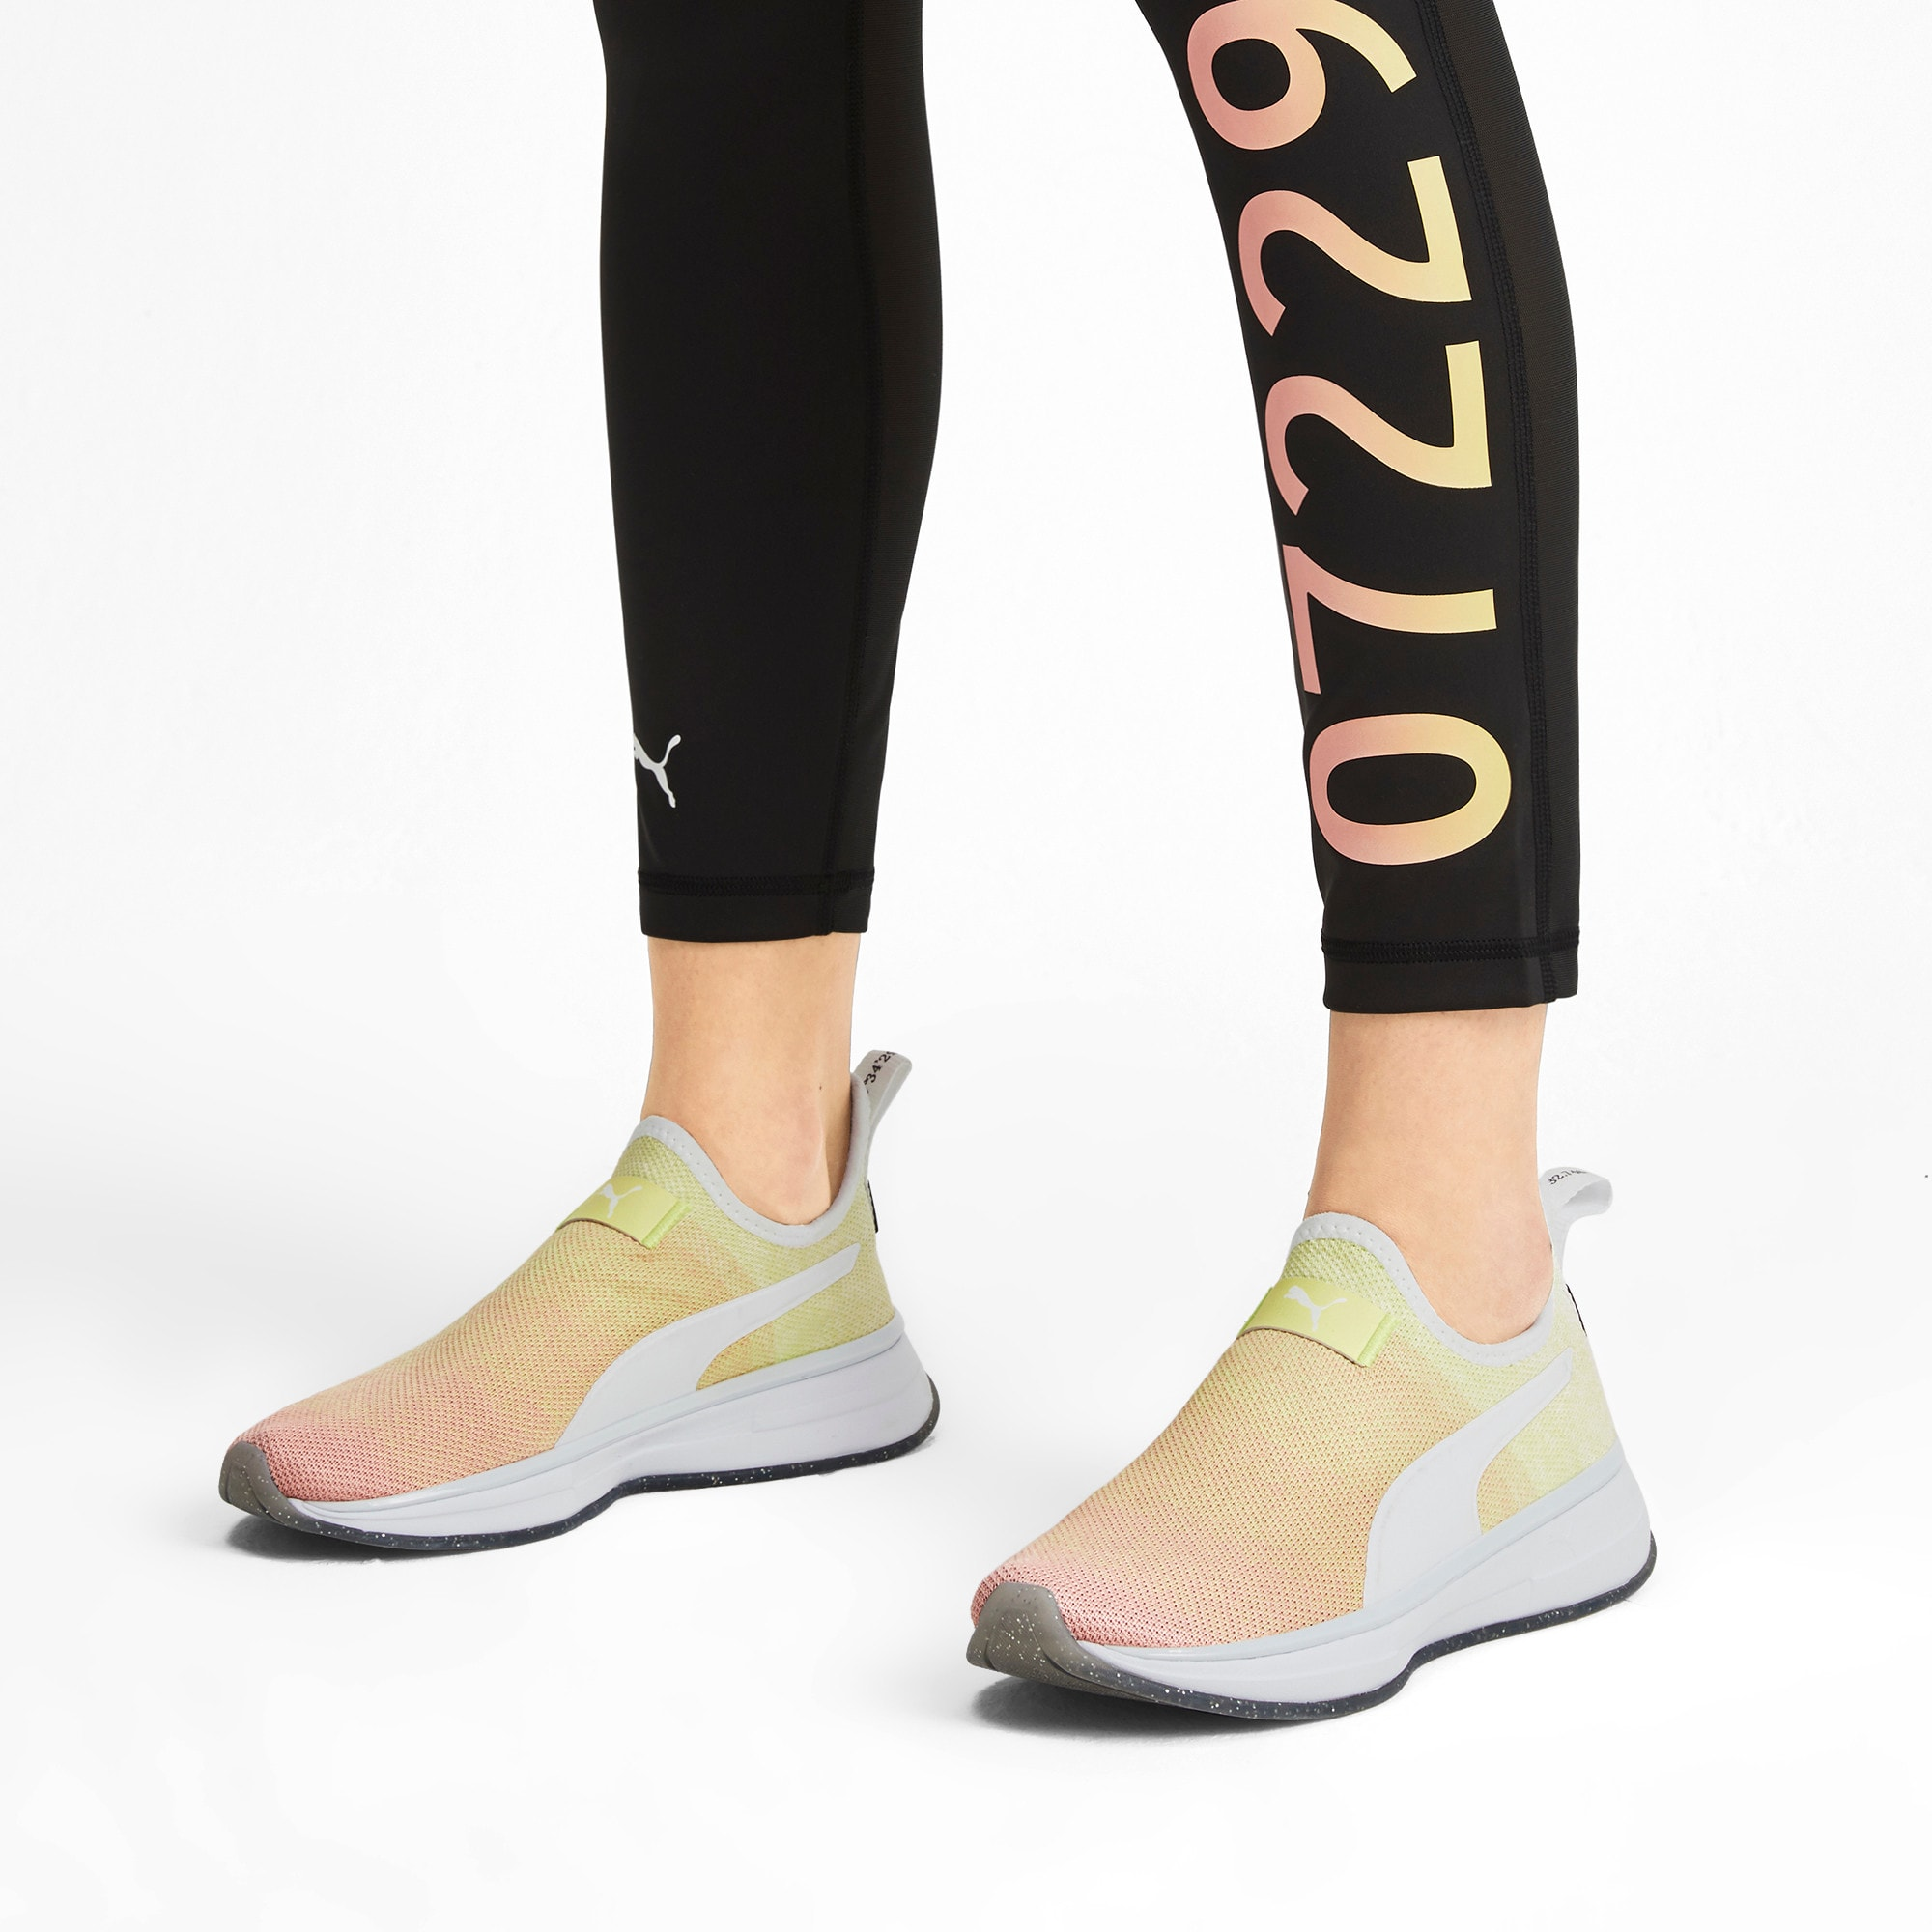 Thumbnail 2 of PUMA x SELENA GOMEZ Slip-On Gradient Women's Training Shoes, YELLOW-Peach Bud-White, medium